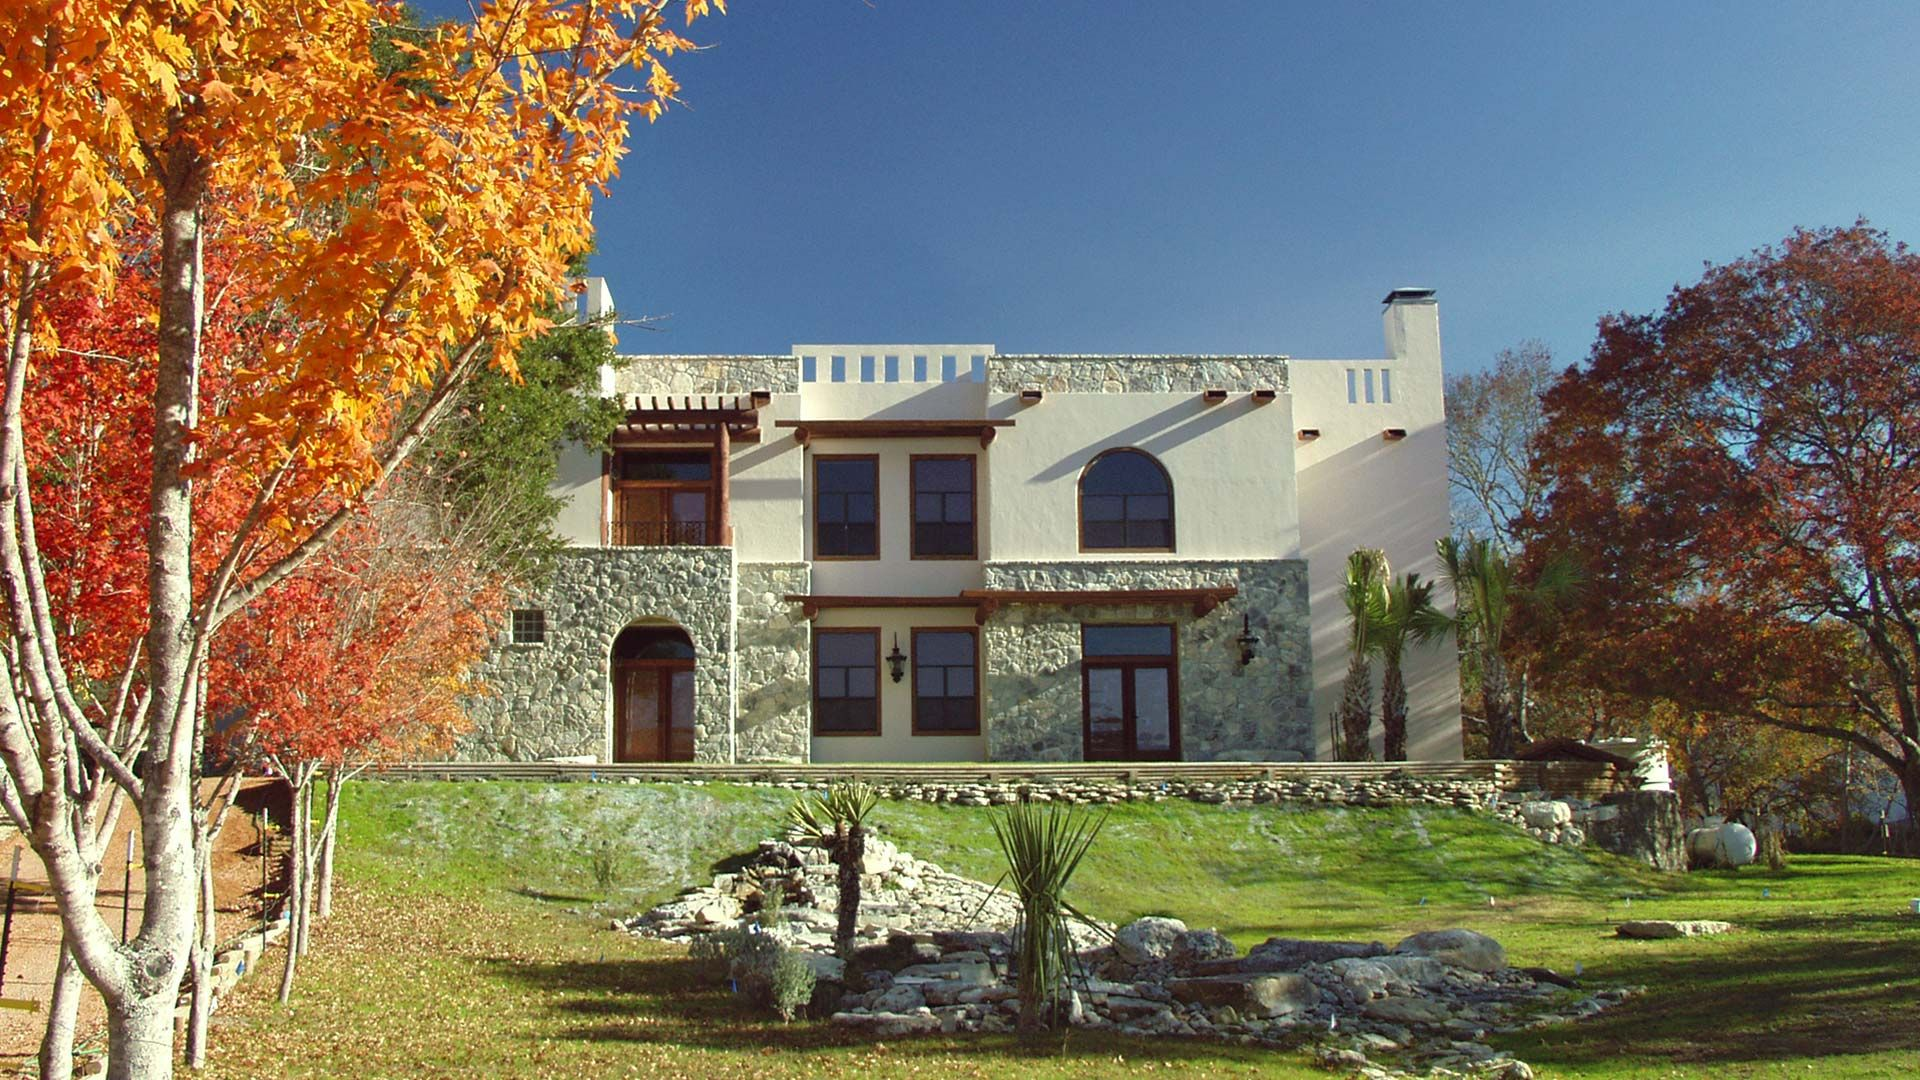 Escondida  Medina TX  Romantic getaways Weekend